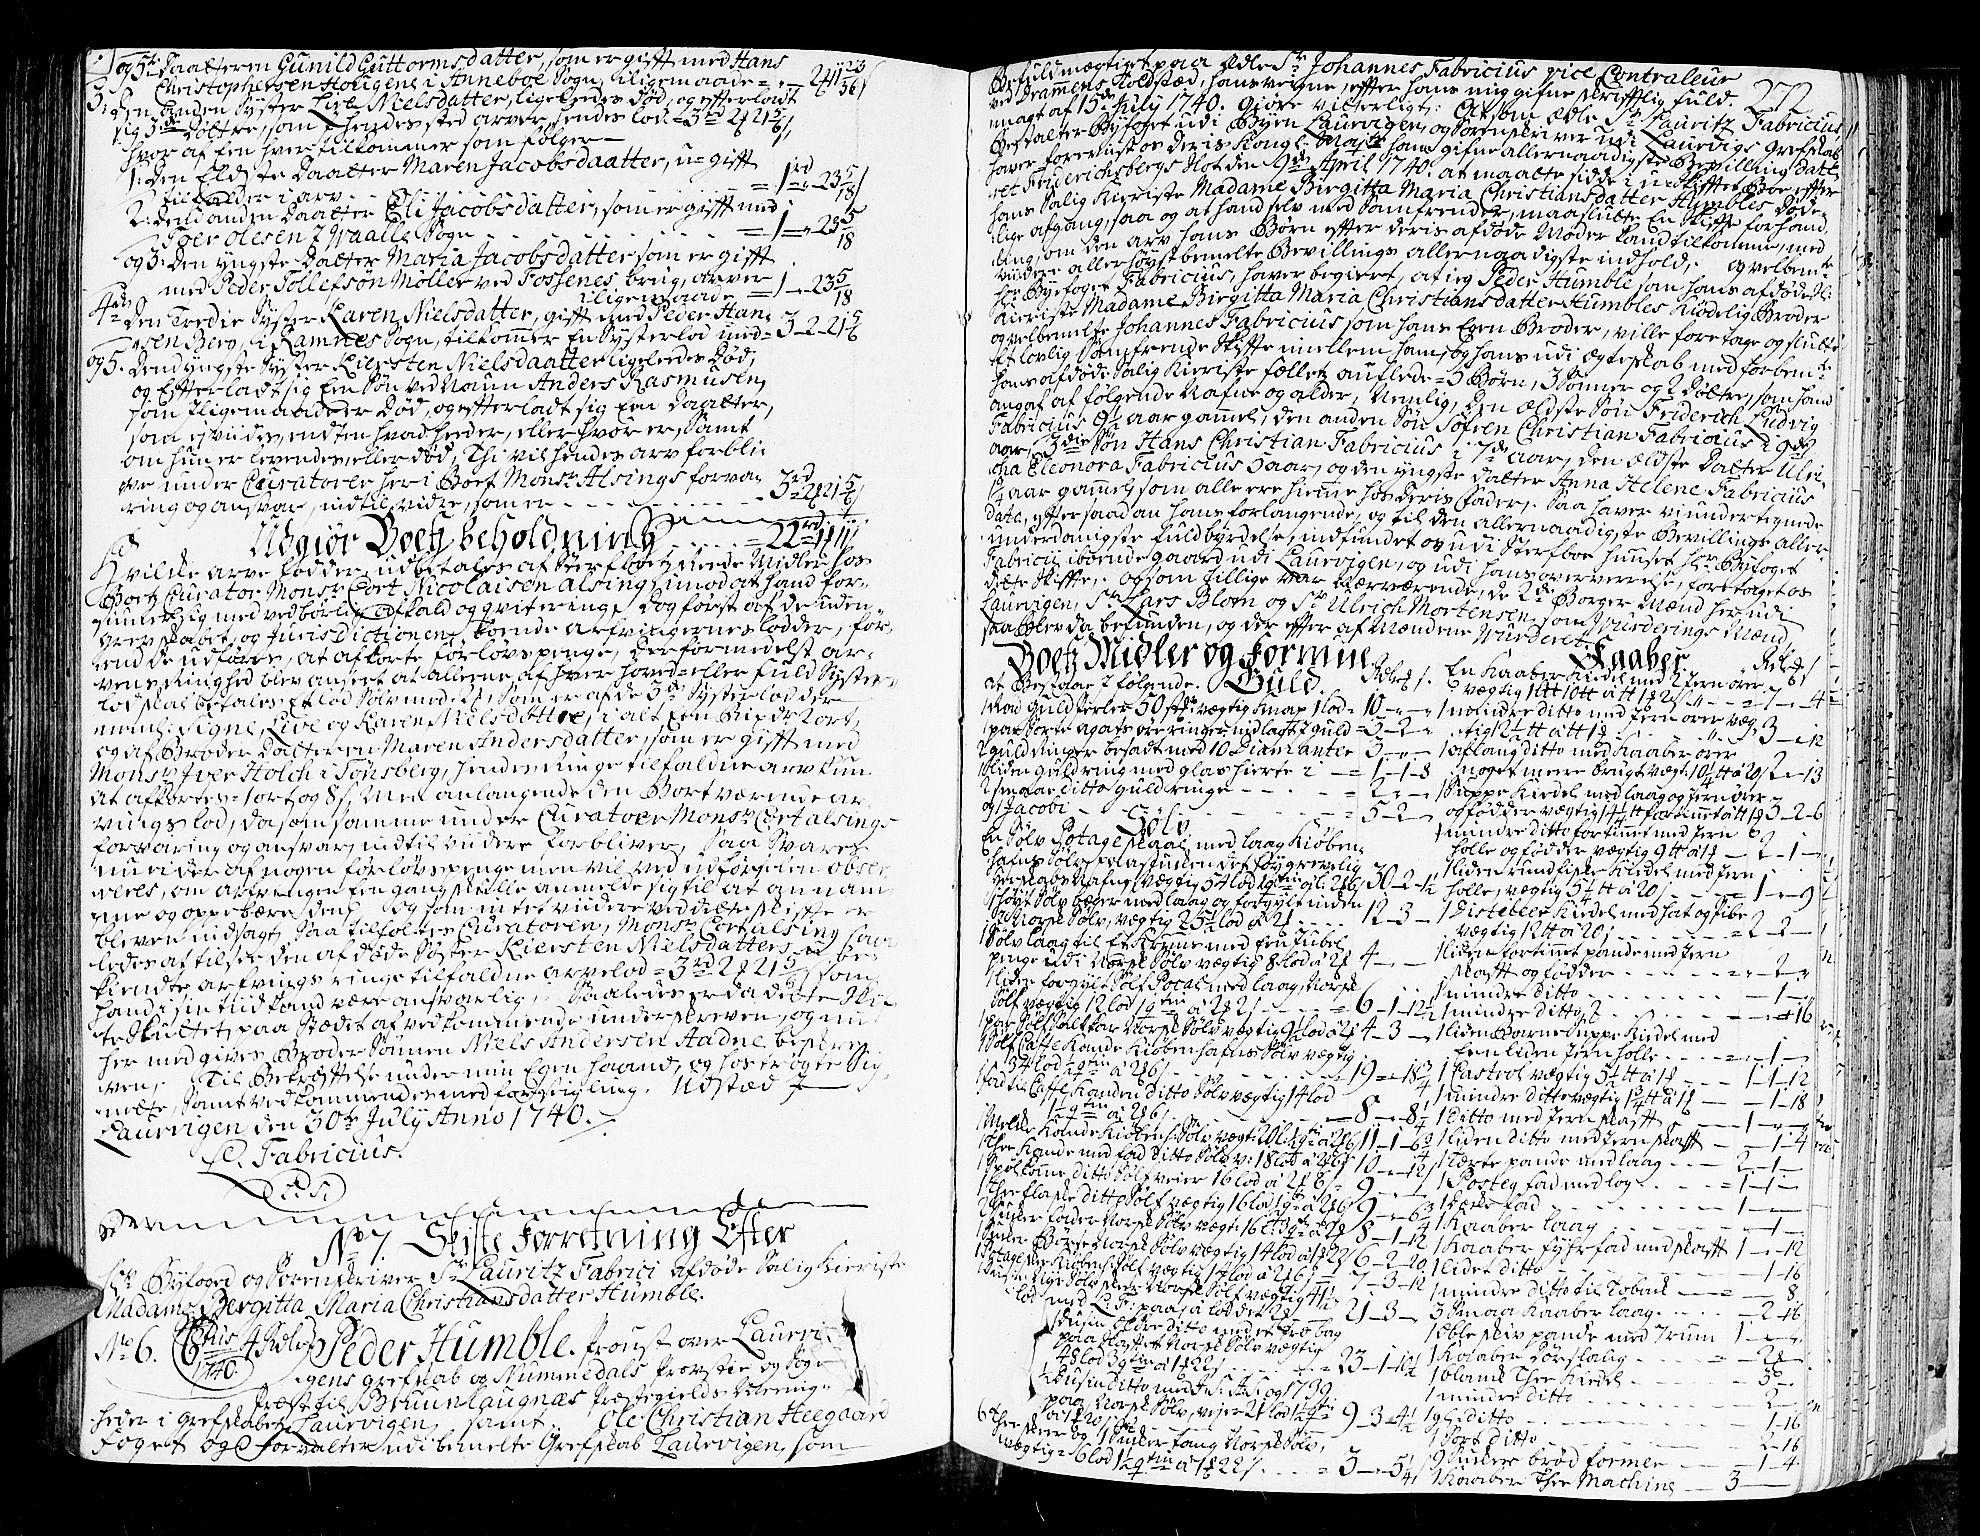 SAKO, Larvik byfogd, H/Hb/Hba/L0008: Skifteprotokoll., 1736-1742, s. 271b-272a